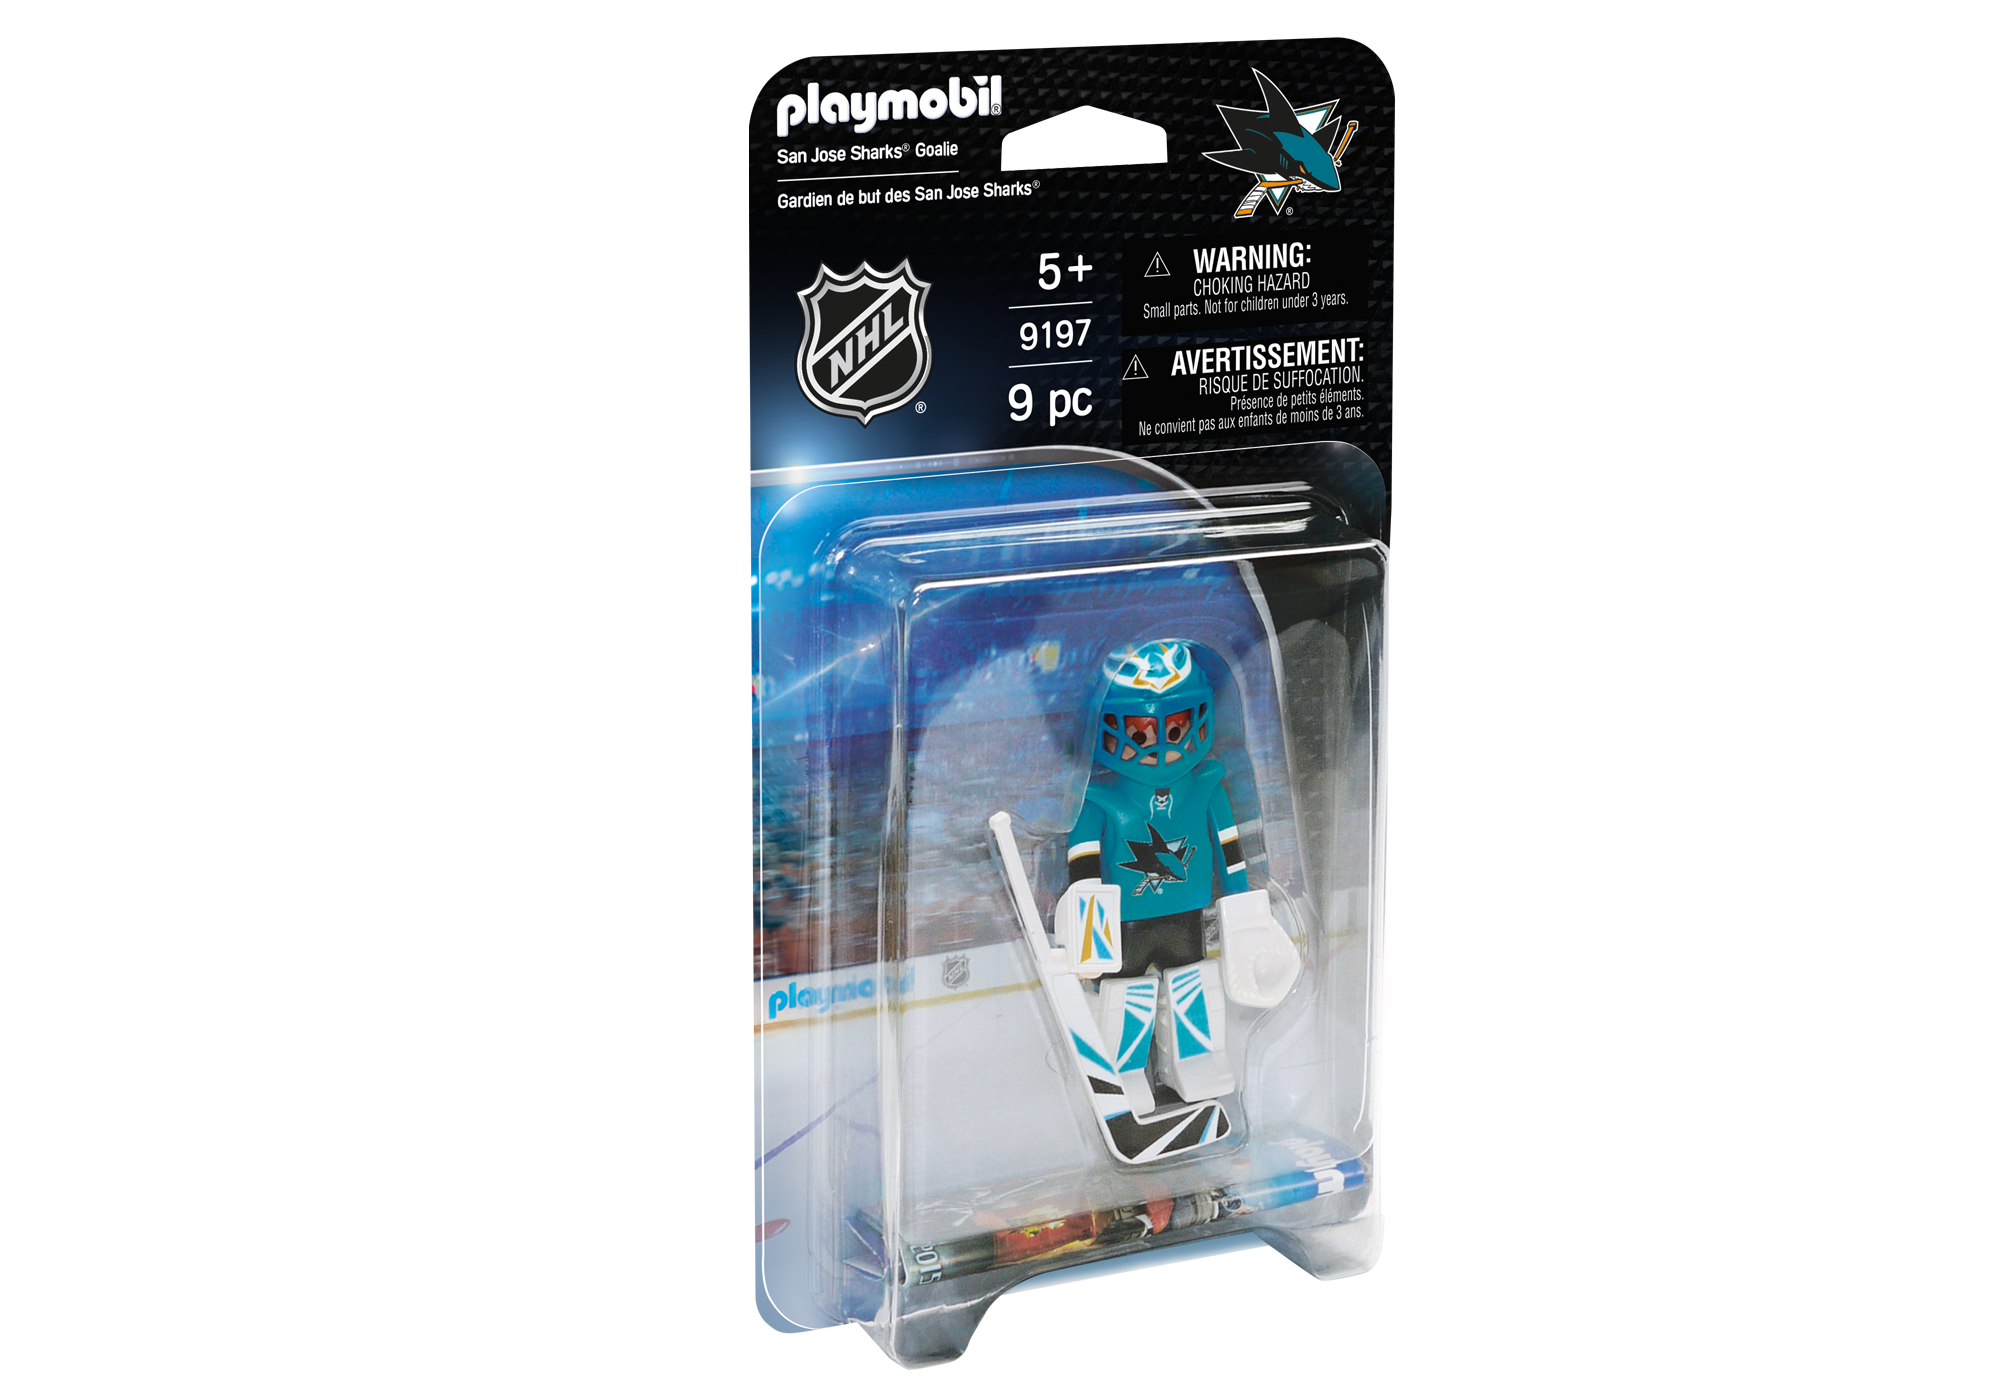 http://media.playmobil.com/i/playmobil/9197_product_box_front/NHL™ San Jose Sharks™ Goalie